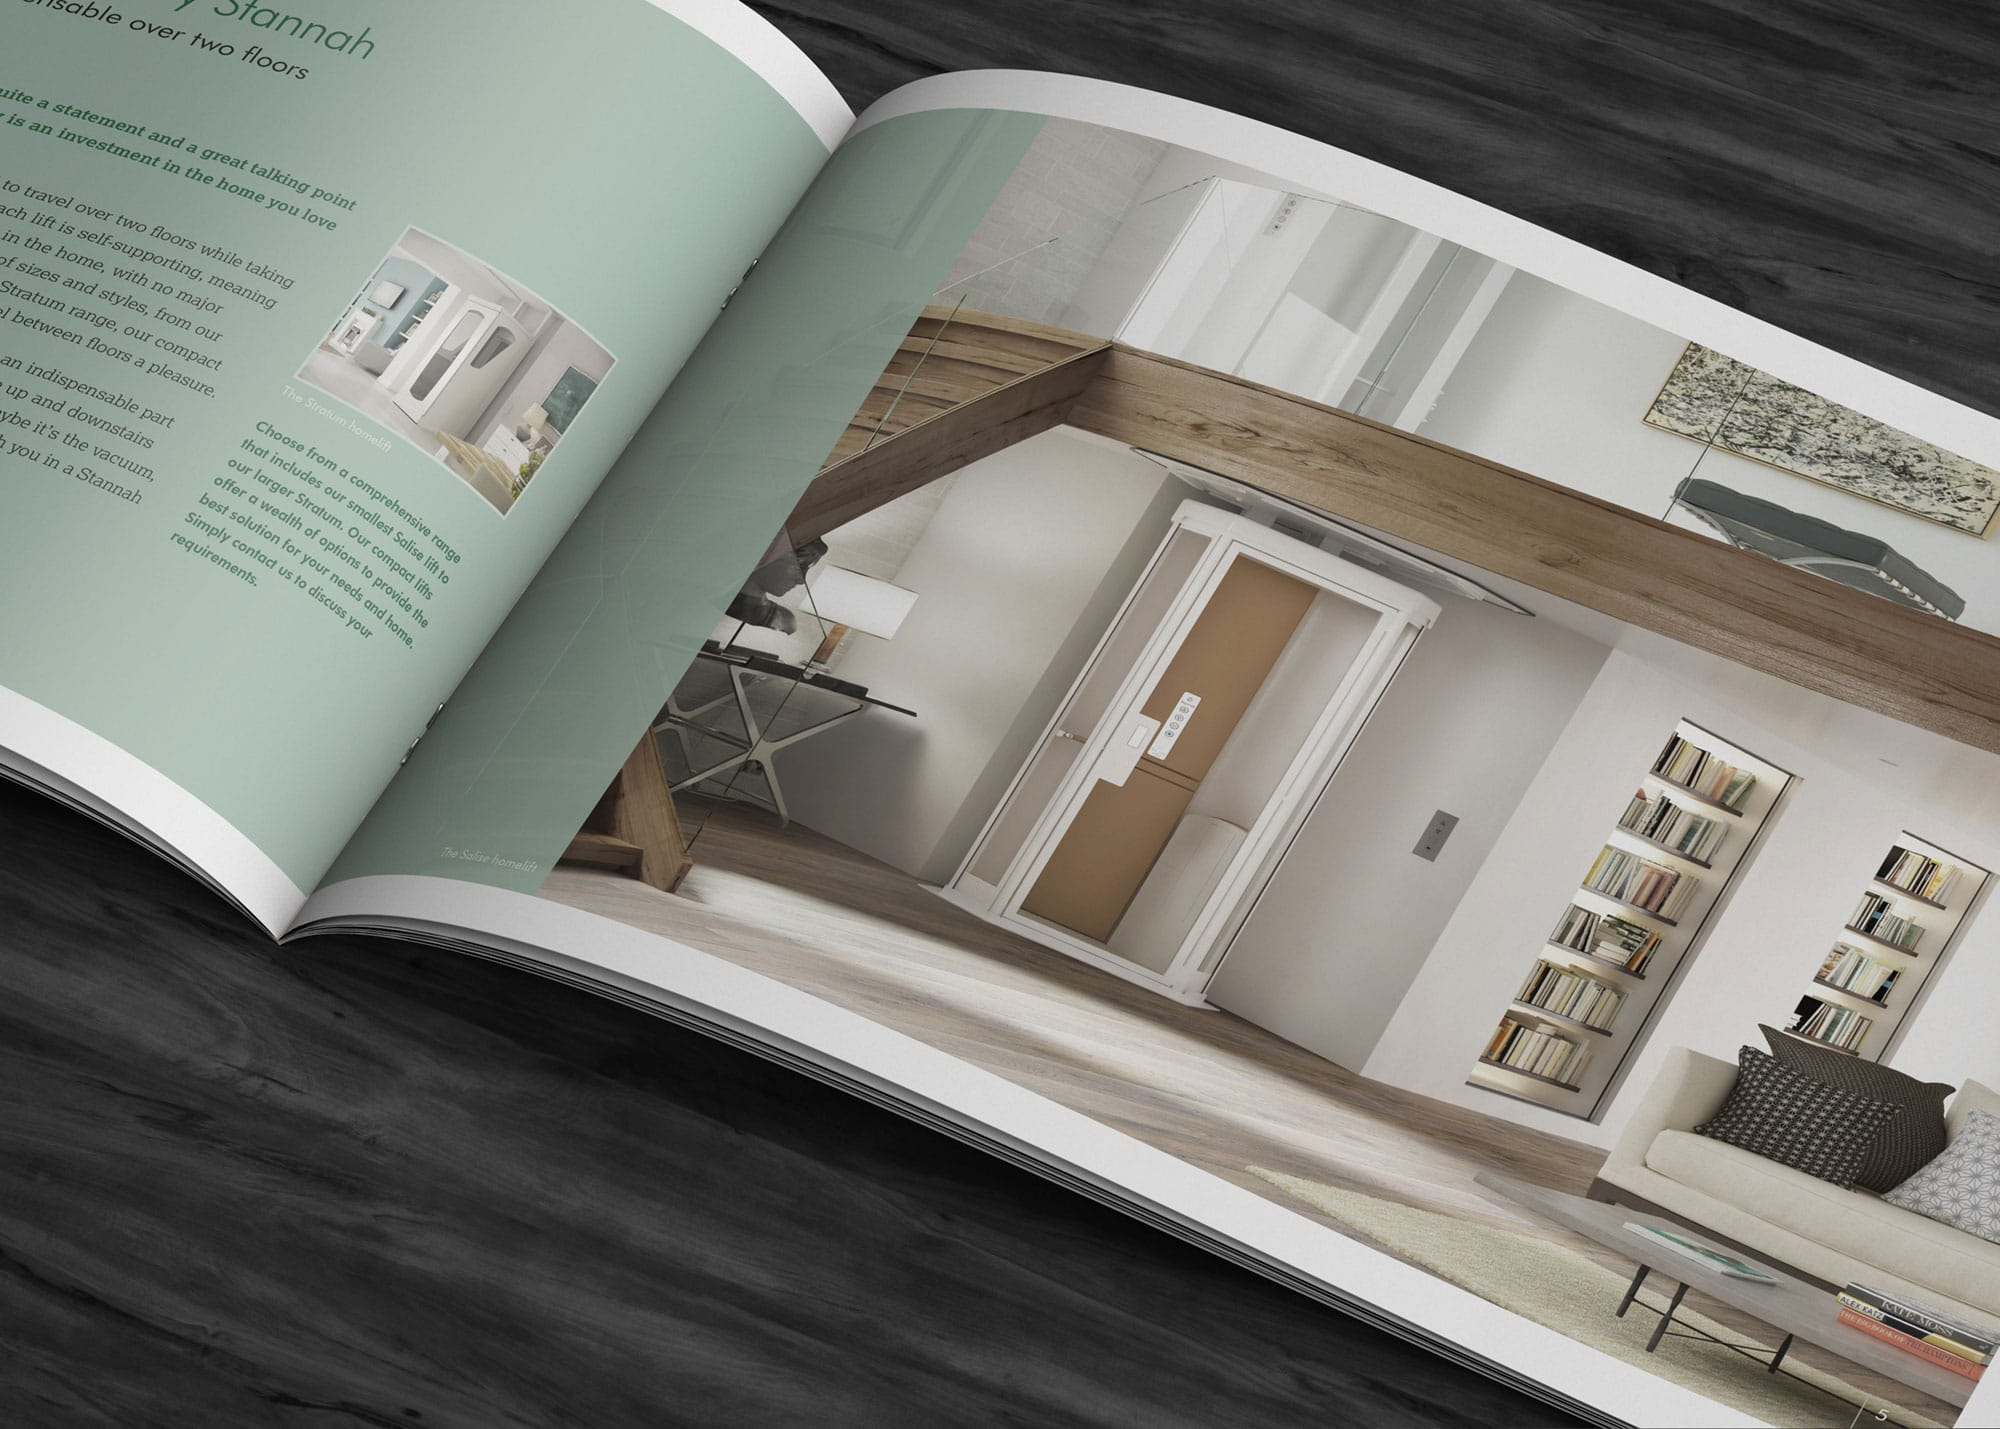 stannah-homelifts-brochure-mockup